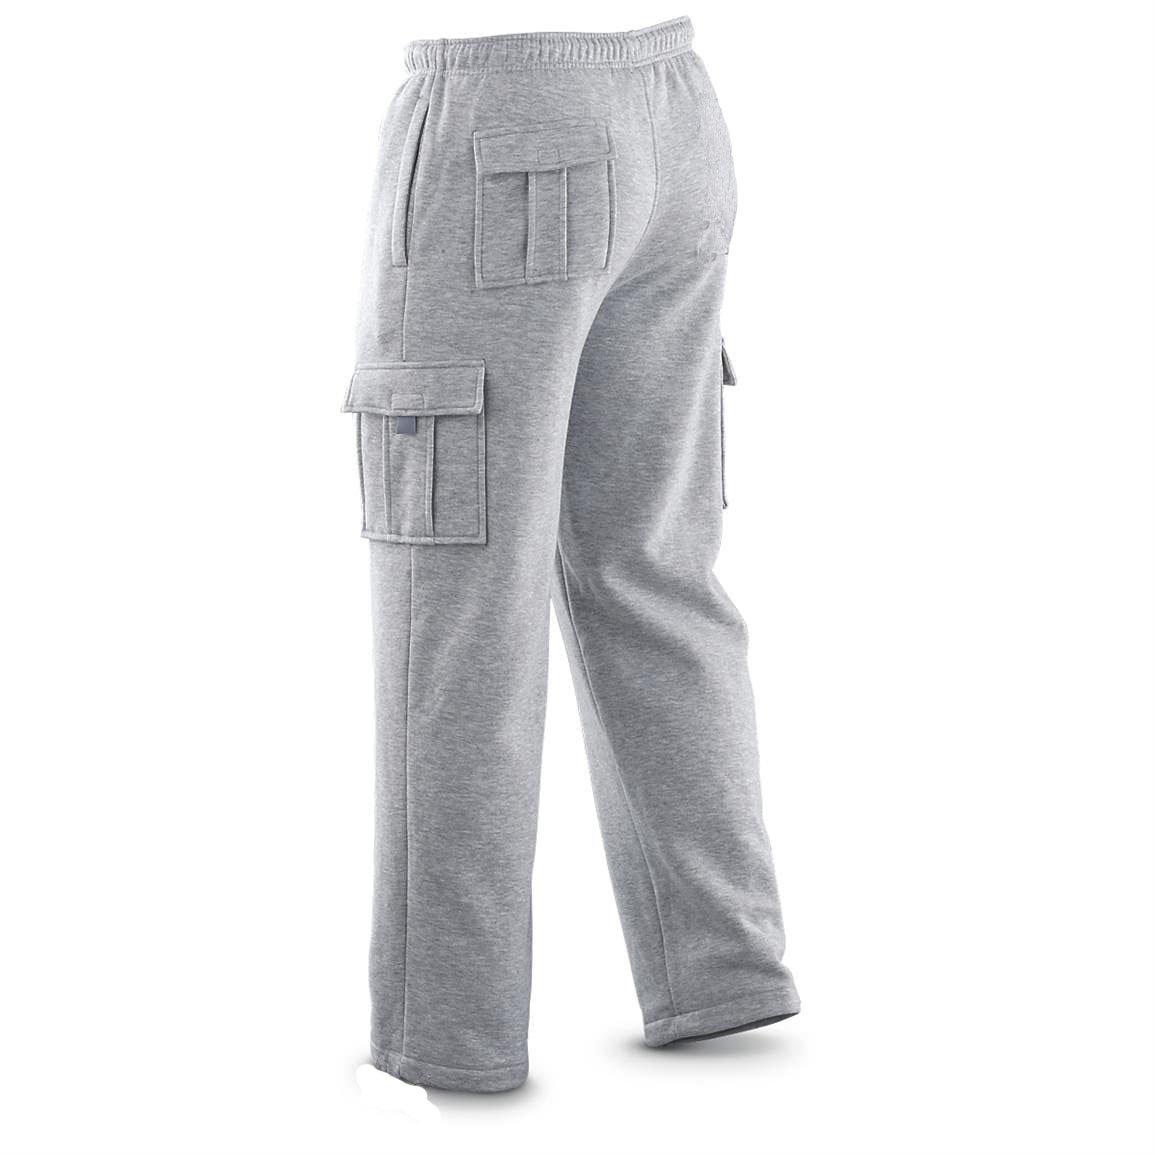 Winter Tex Mens Cargo Pants Sweatpants Truck Fleece Heavy Weight with Elastic Waistband, Fleeced Cargo Pants L-XXL